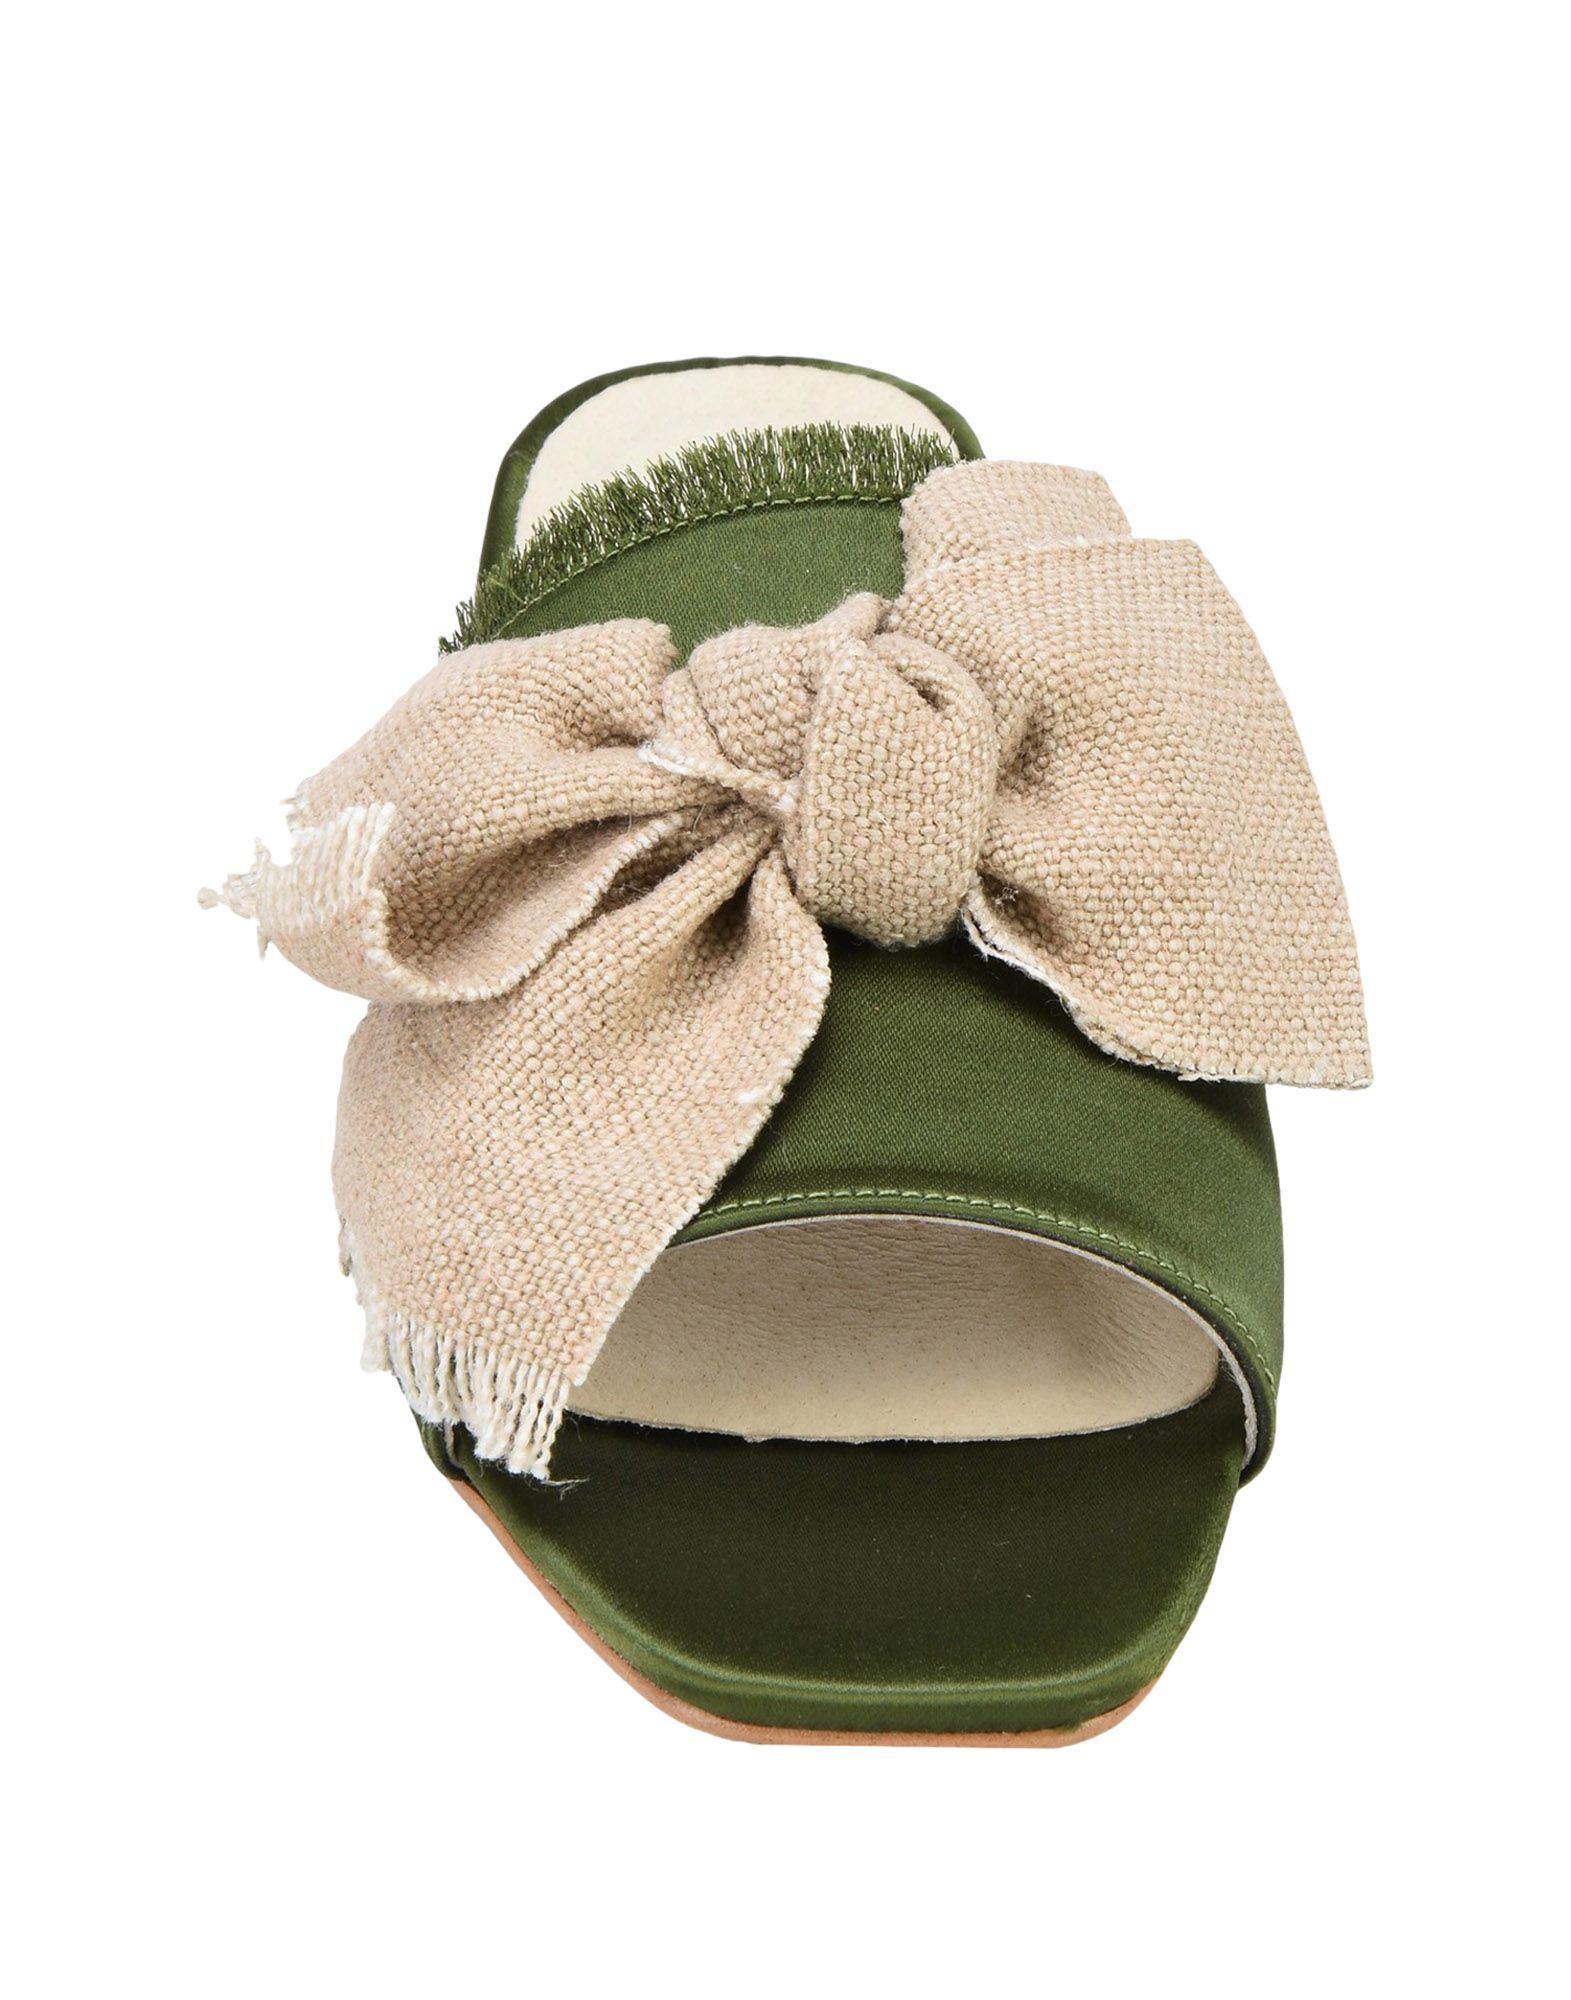 George J. Love Sandalen Damen Damen Damen  11456523DC Neue Schuhe 3aef6b